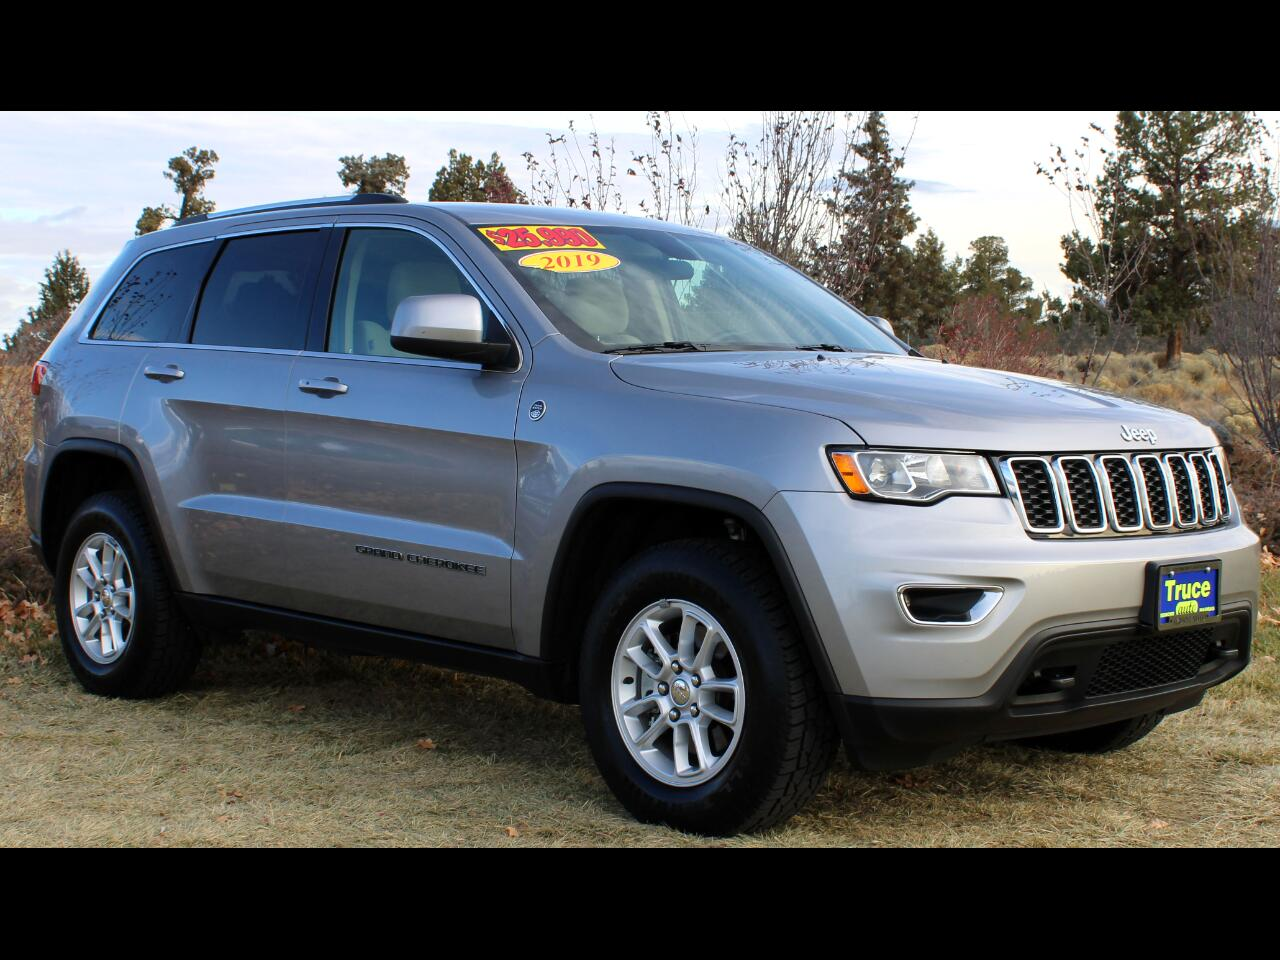 Jeep Grand Cherokee 4dr Laredo 4WD 2019